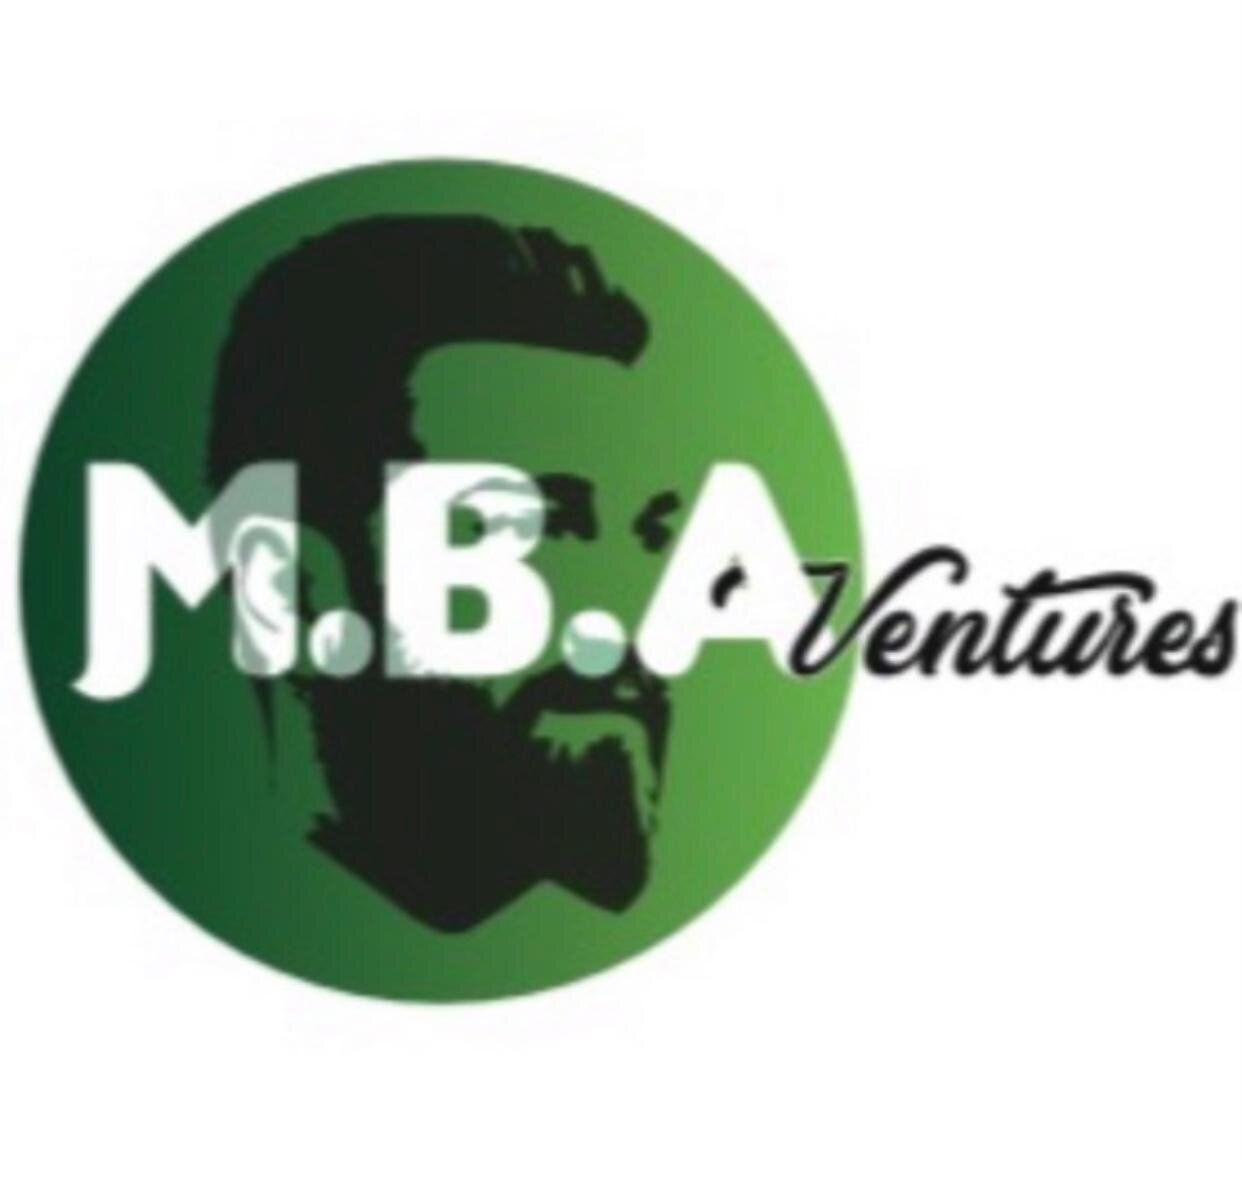 M.B.A. VENTURES